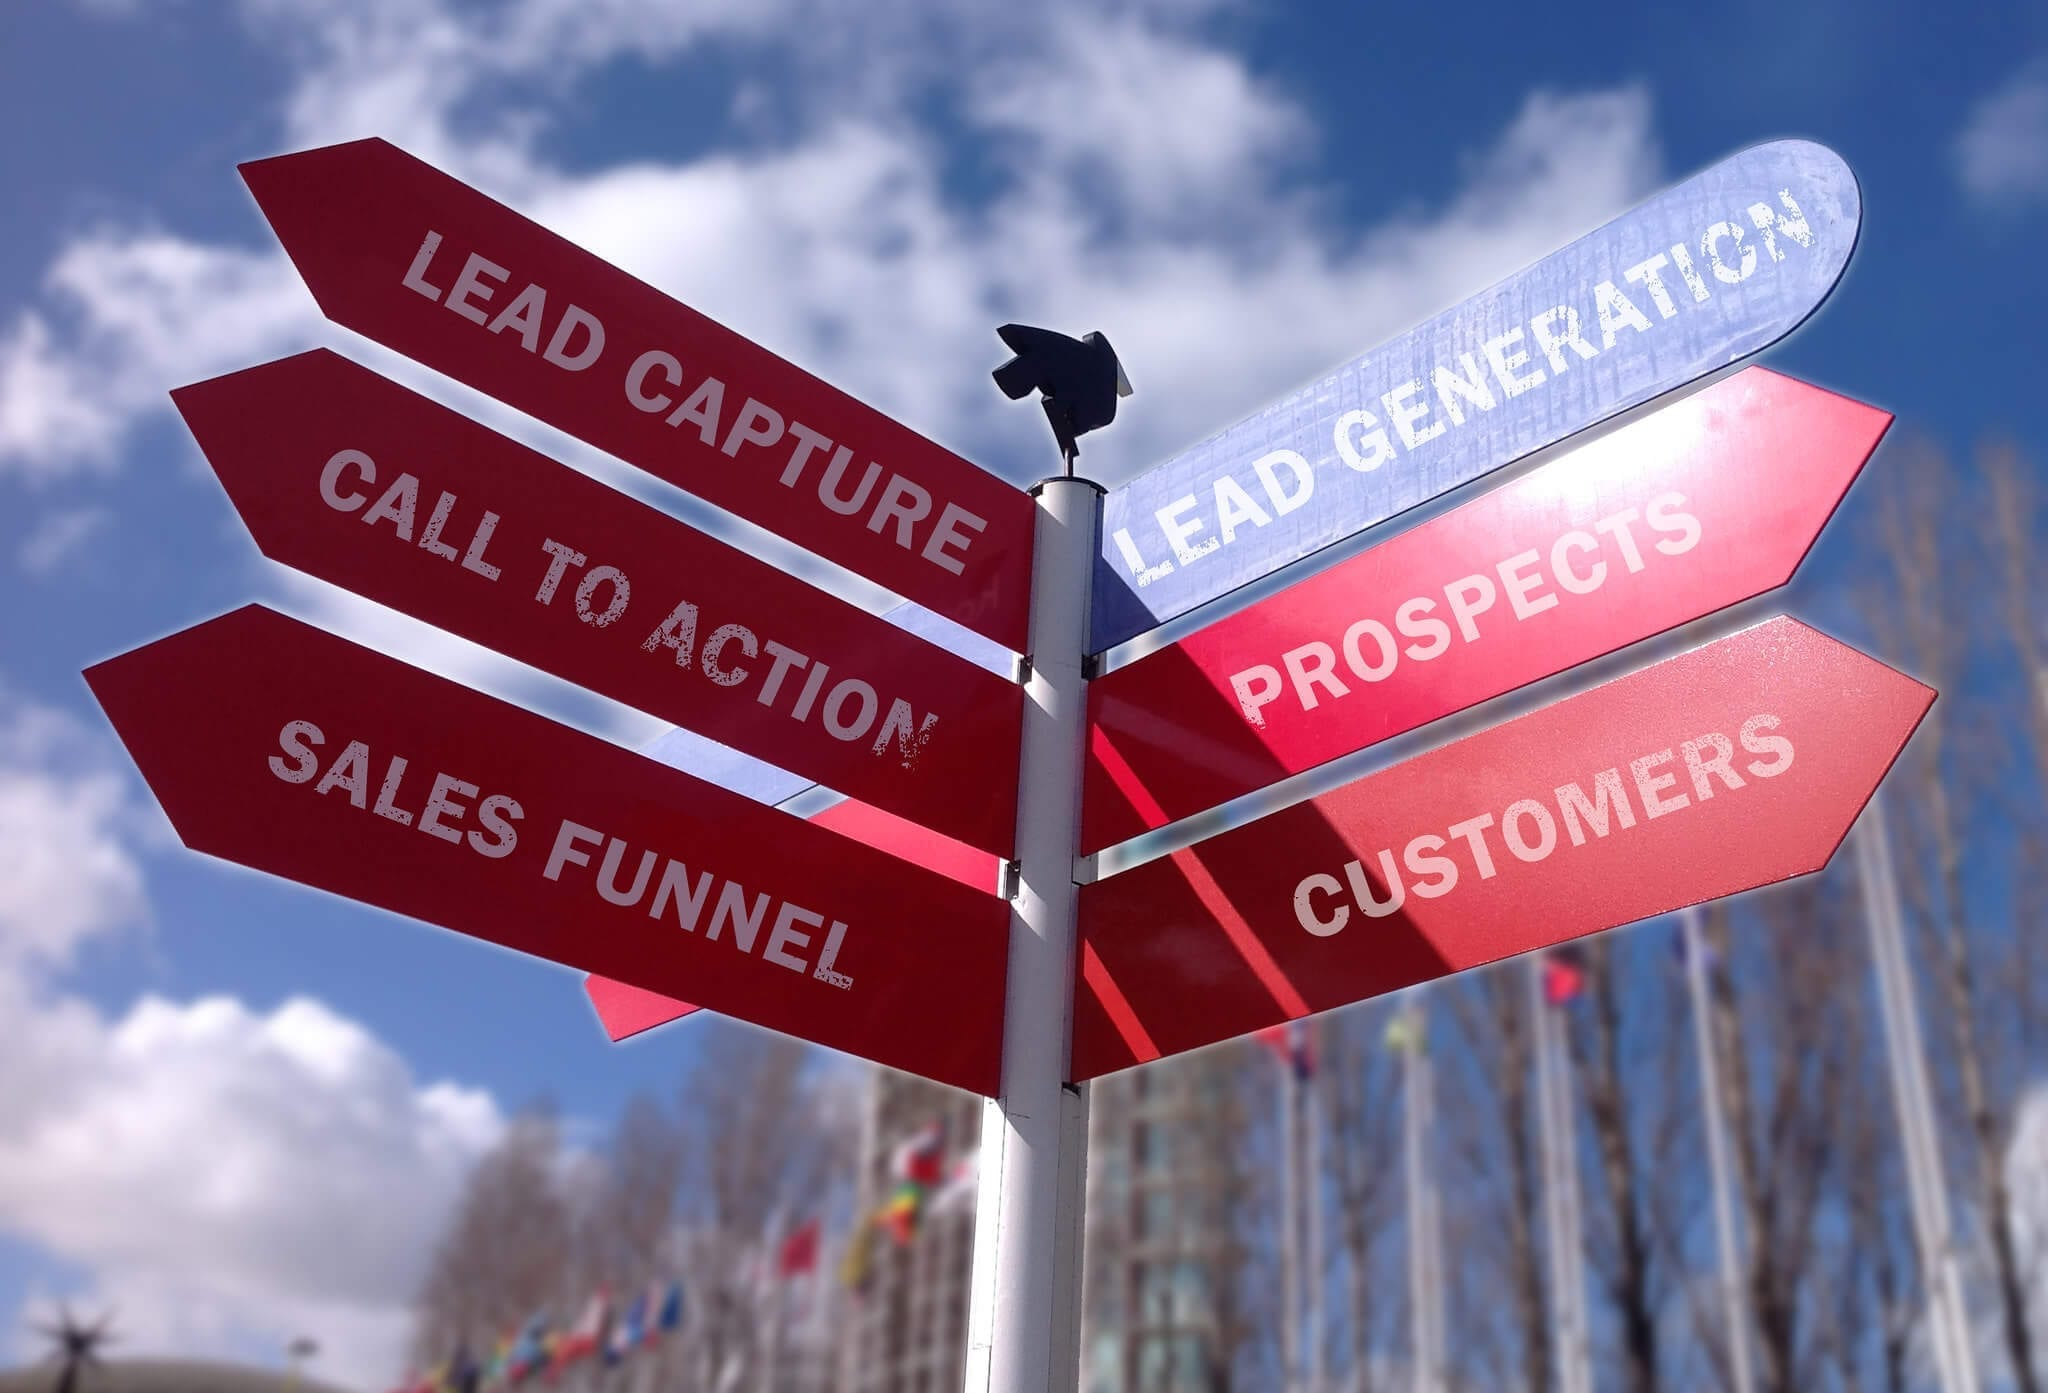 Lead generation, nurturing, lead scoring, lead capture